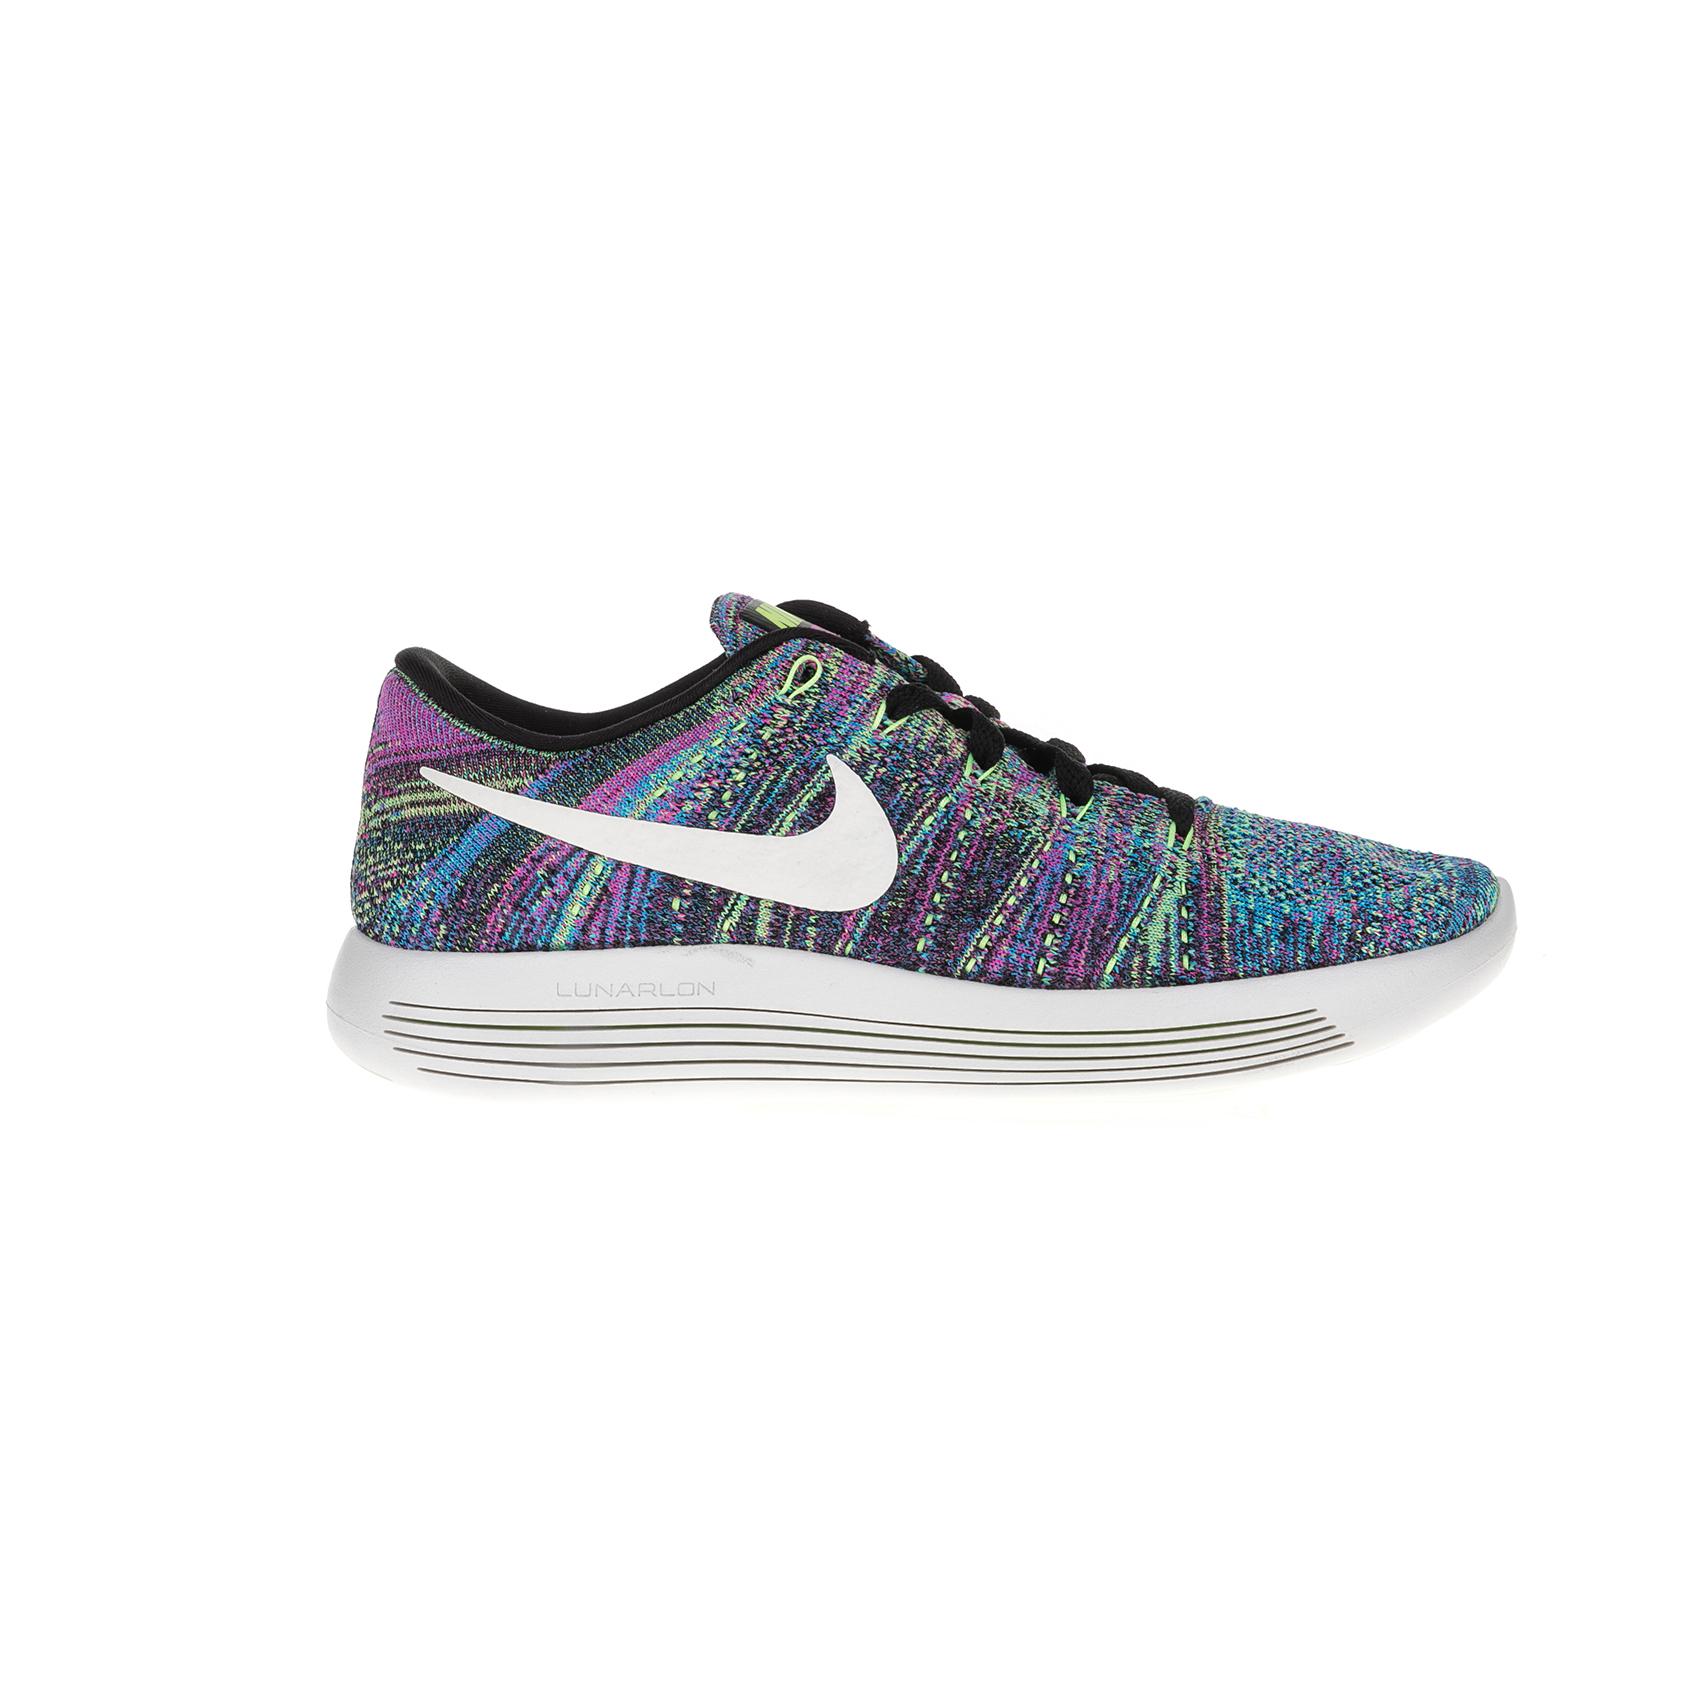 NIKE – Γυναικεία αθλητικά παπούτσια Nike LUNAREPIC LOW FLYKNIT πολύχρωμα